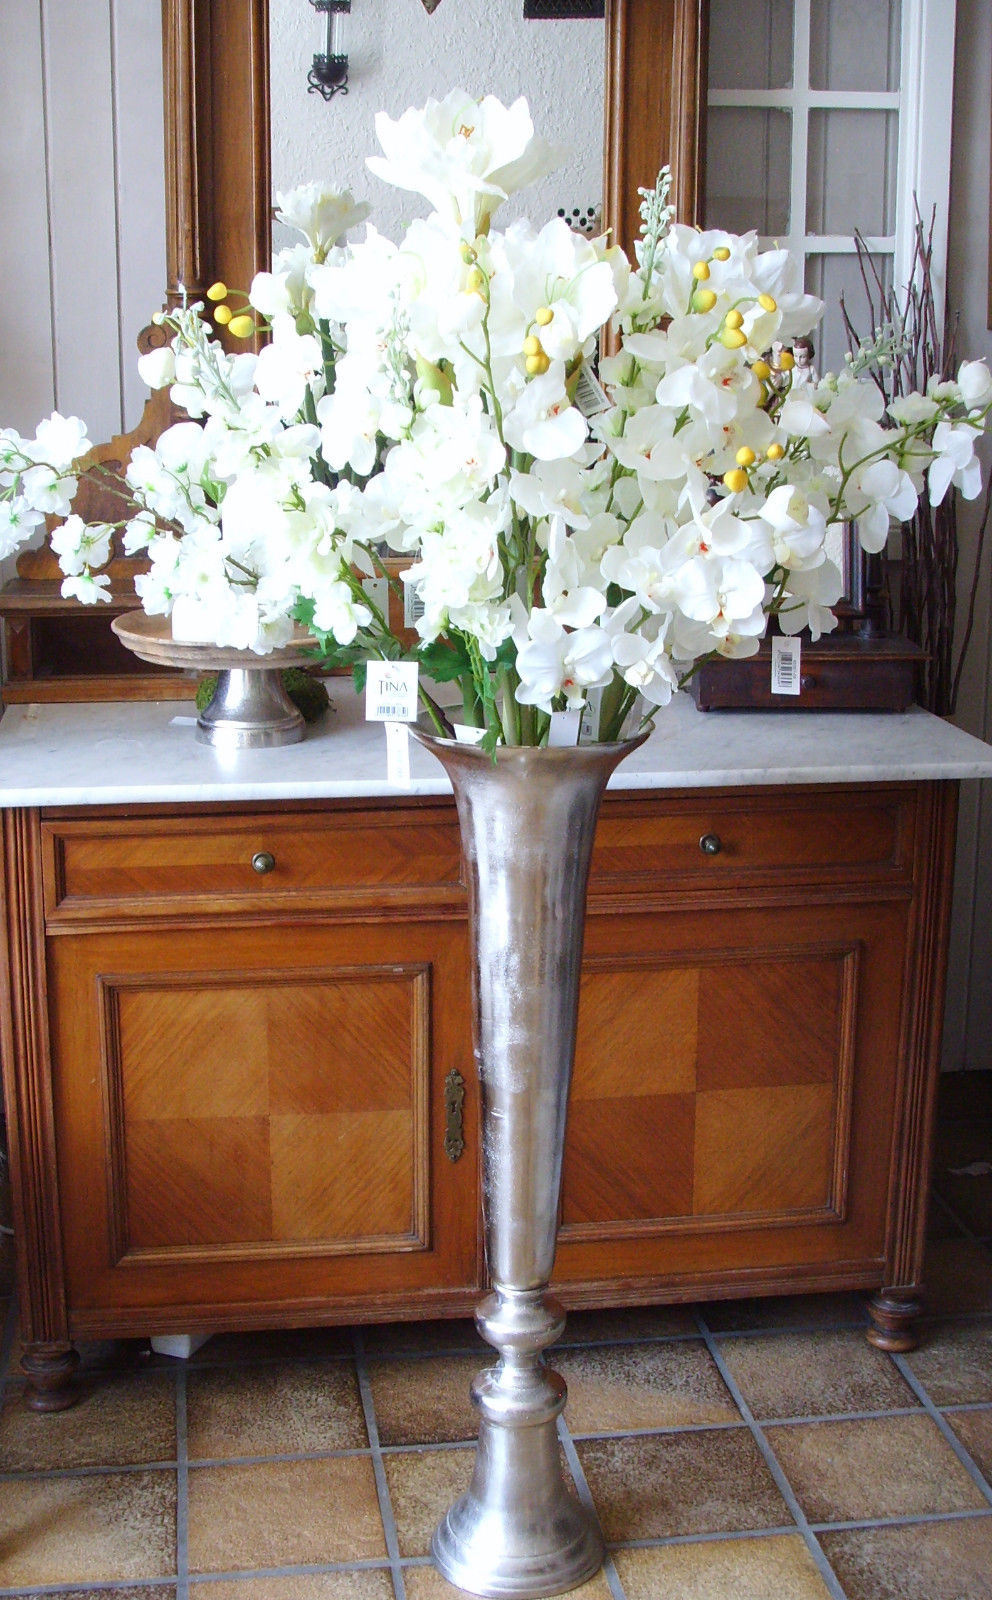 vase bodenvase pokal amphore pokalvase silber chrom metall edel xxl 85 cm gro antik mit stil. Black Bedroom Furniture Sets. Home Design Ideas